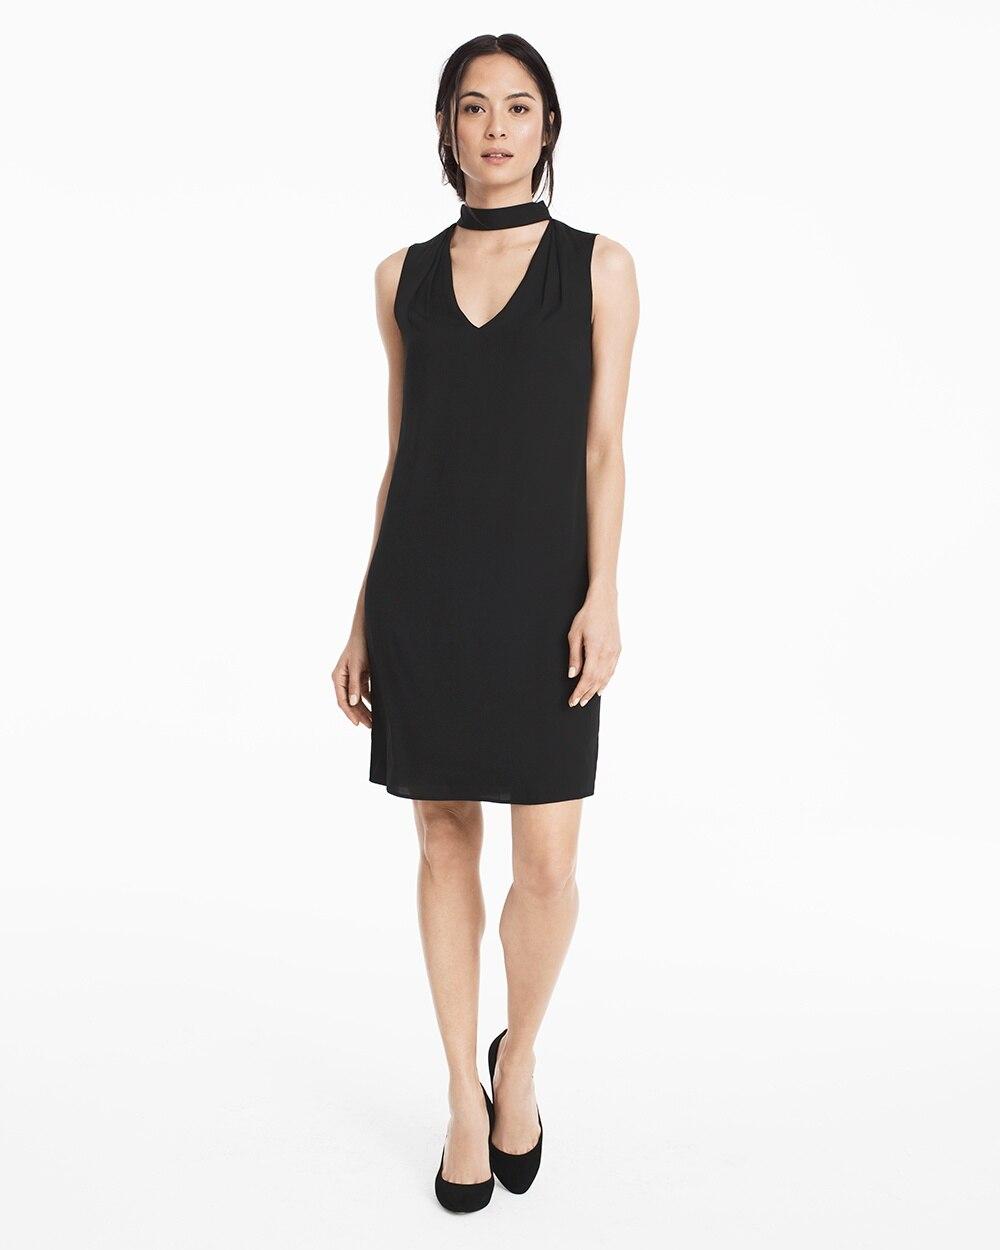 Sleeveless Choker Black Shift Dress White House Black Market